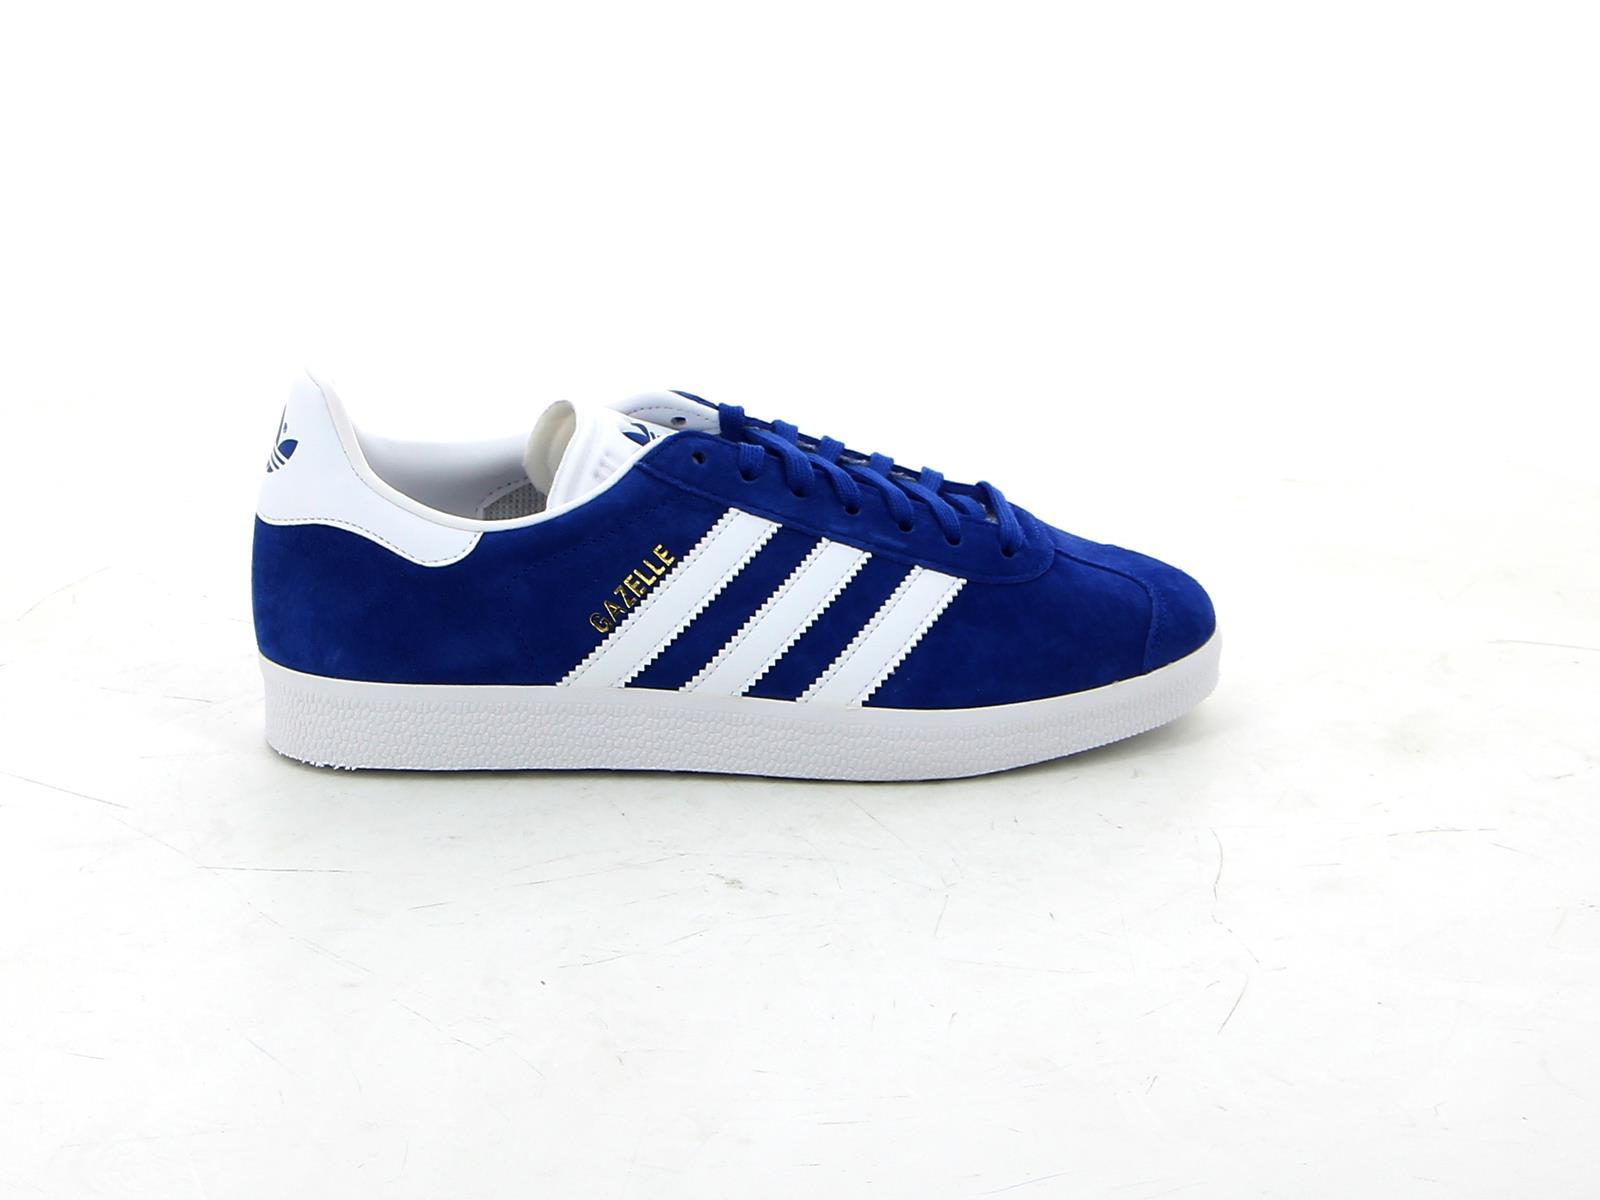 adidas gazelle uruguay